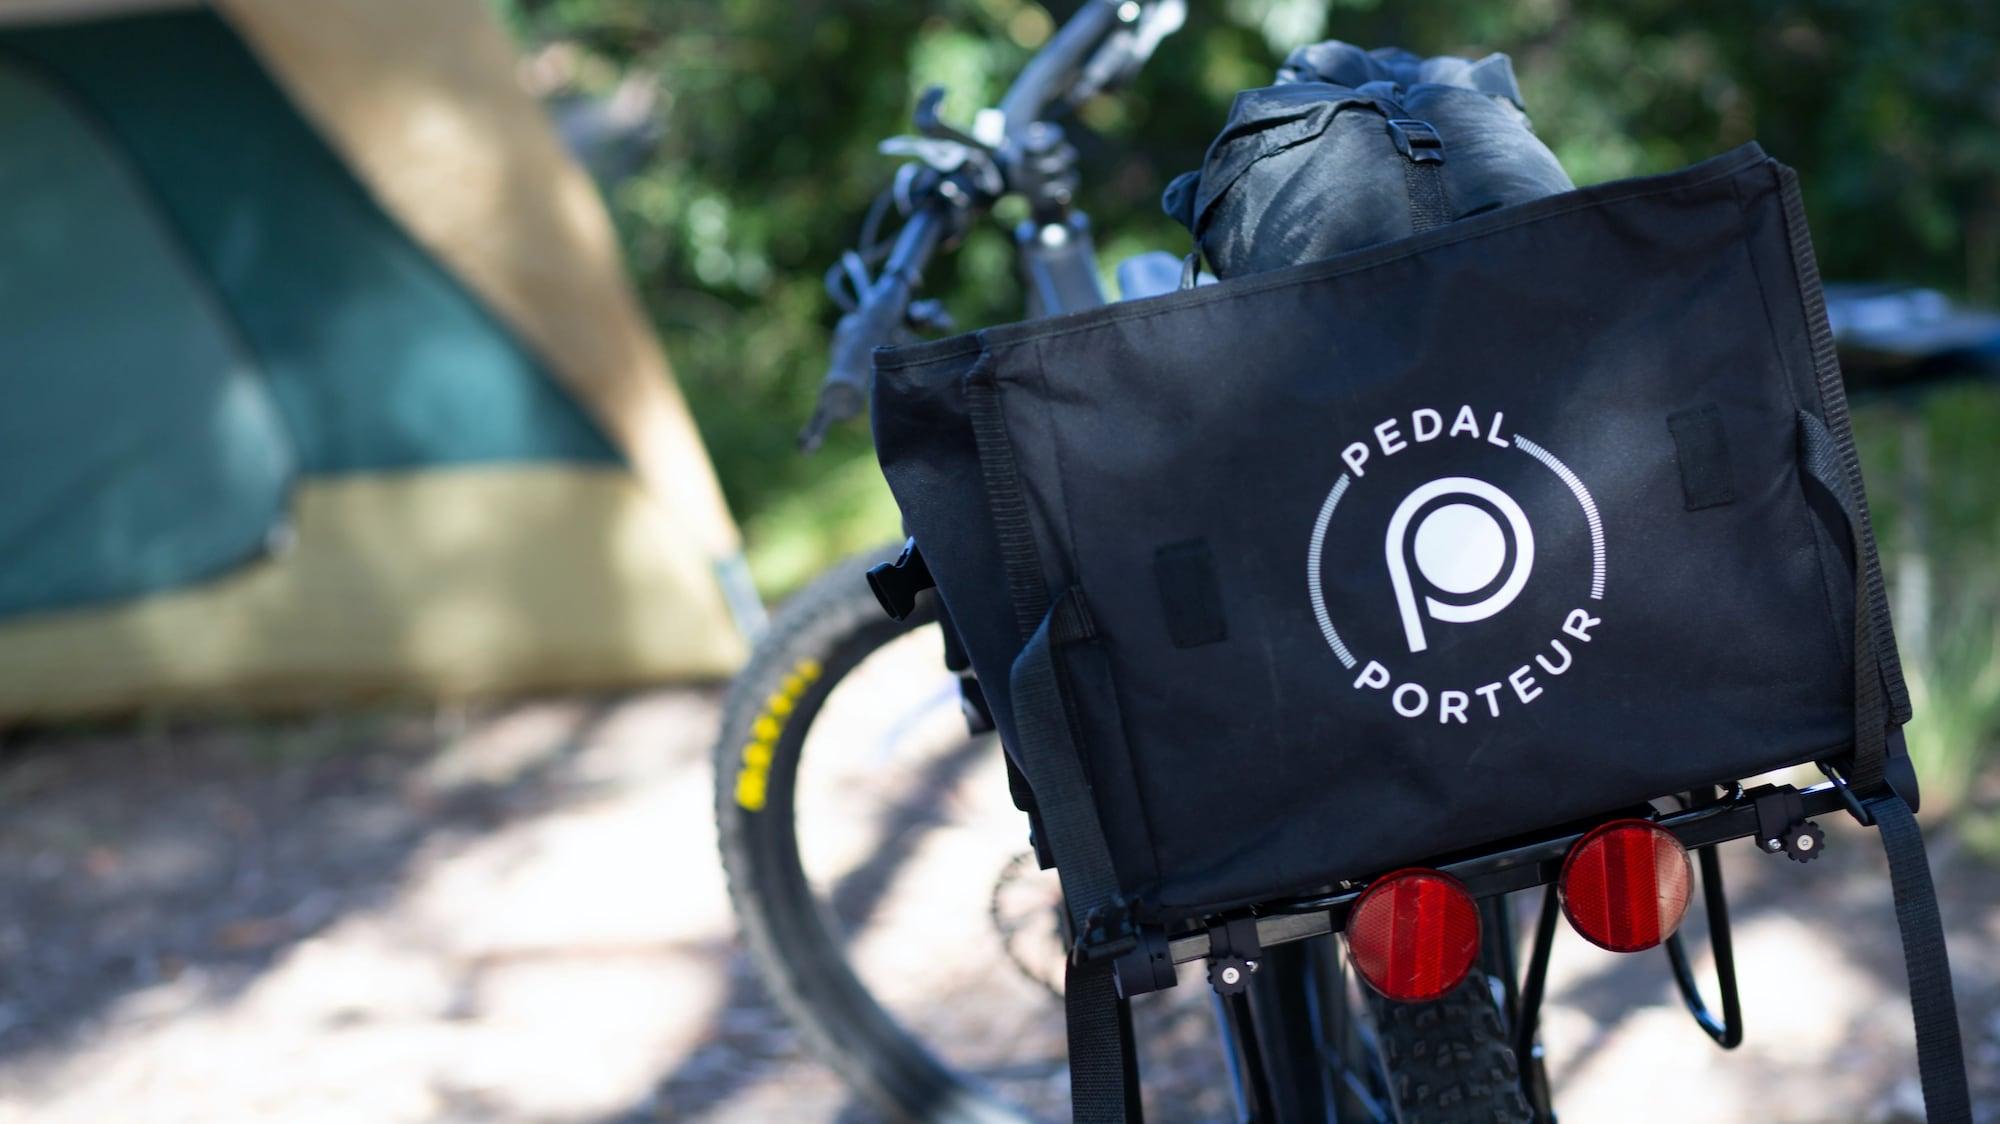 PedalPorteur Bicycle Cargo System